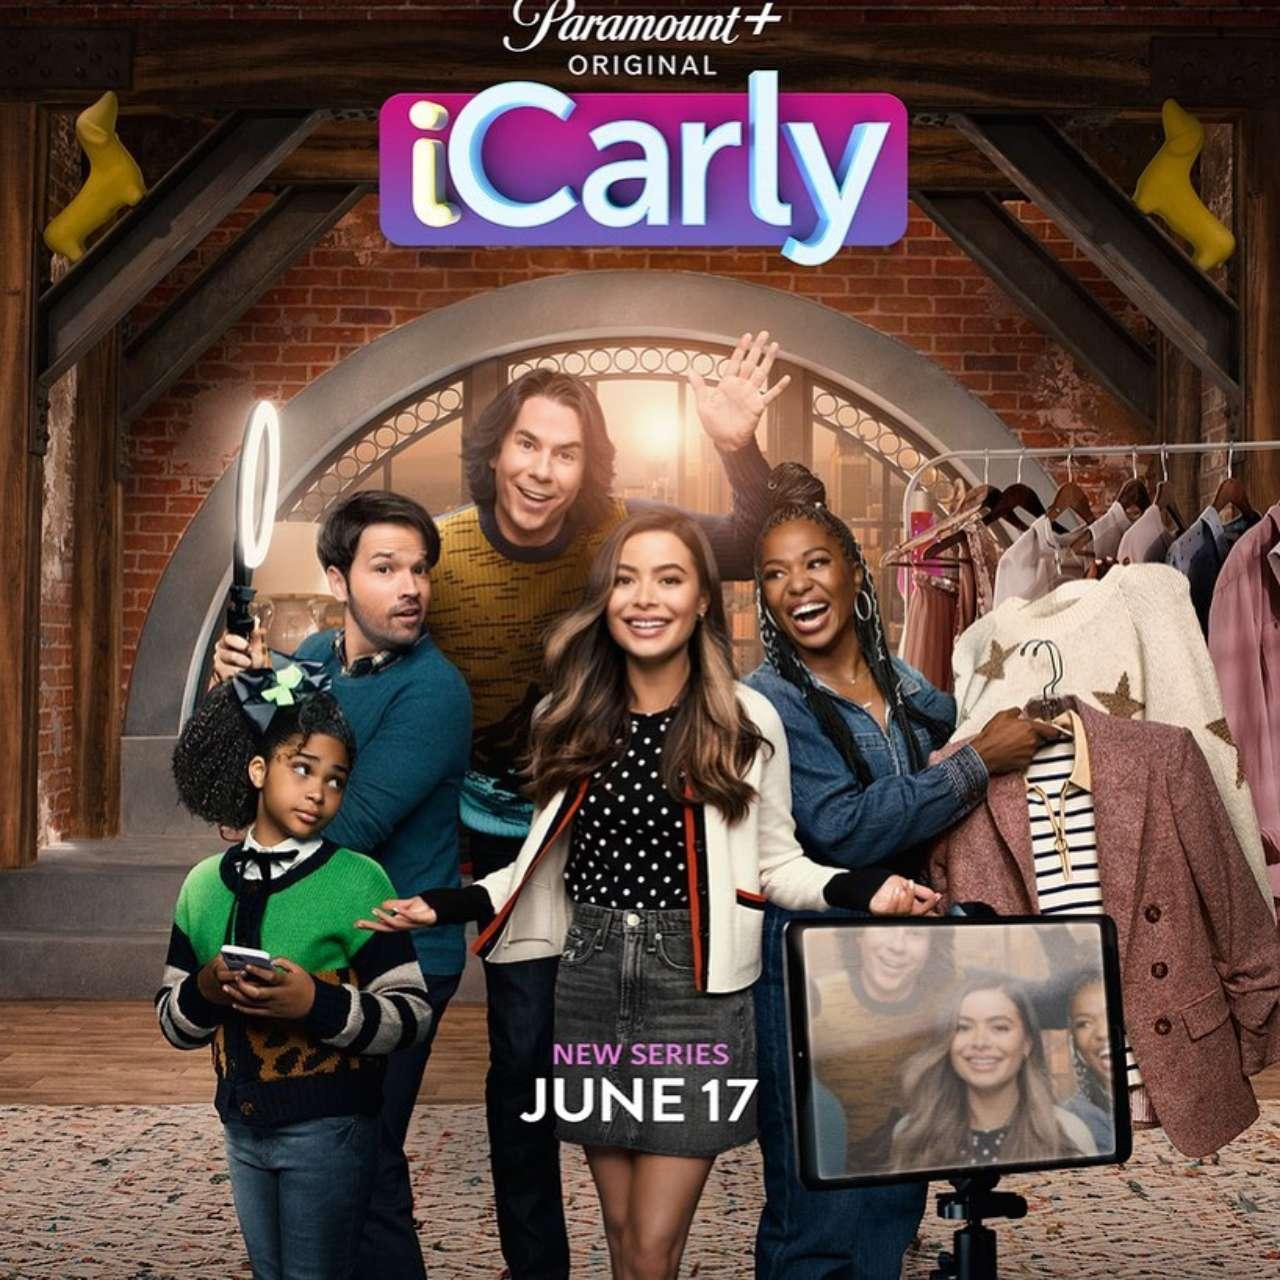 iCarly regresa a la pantalla